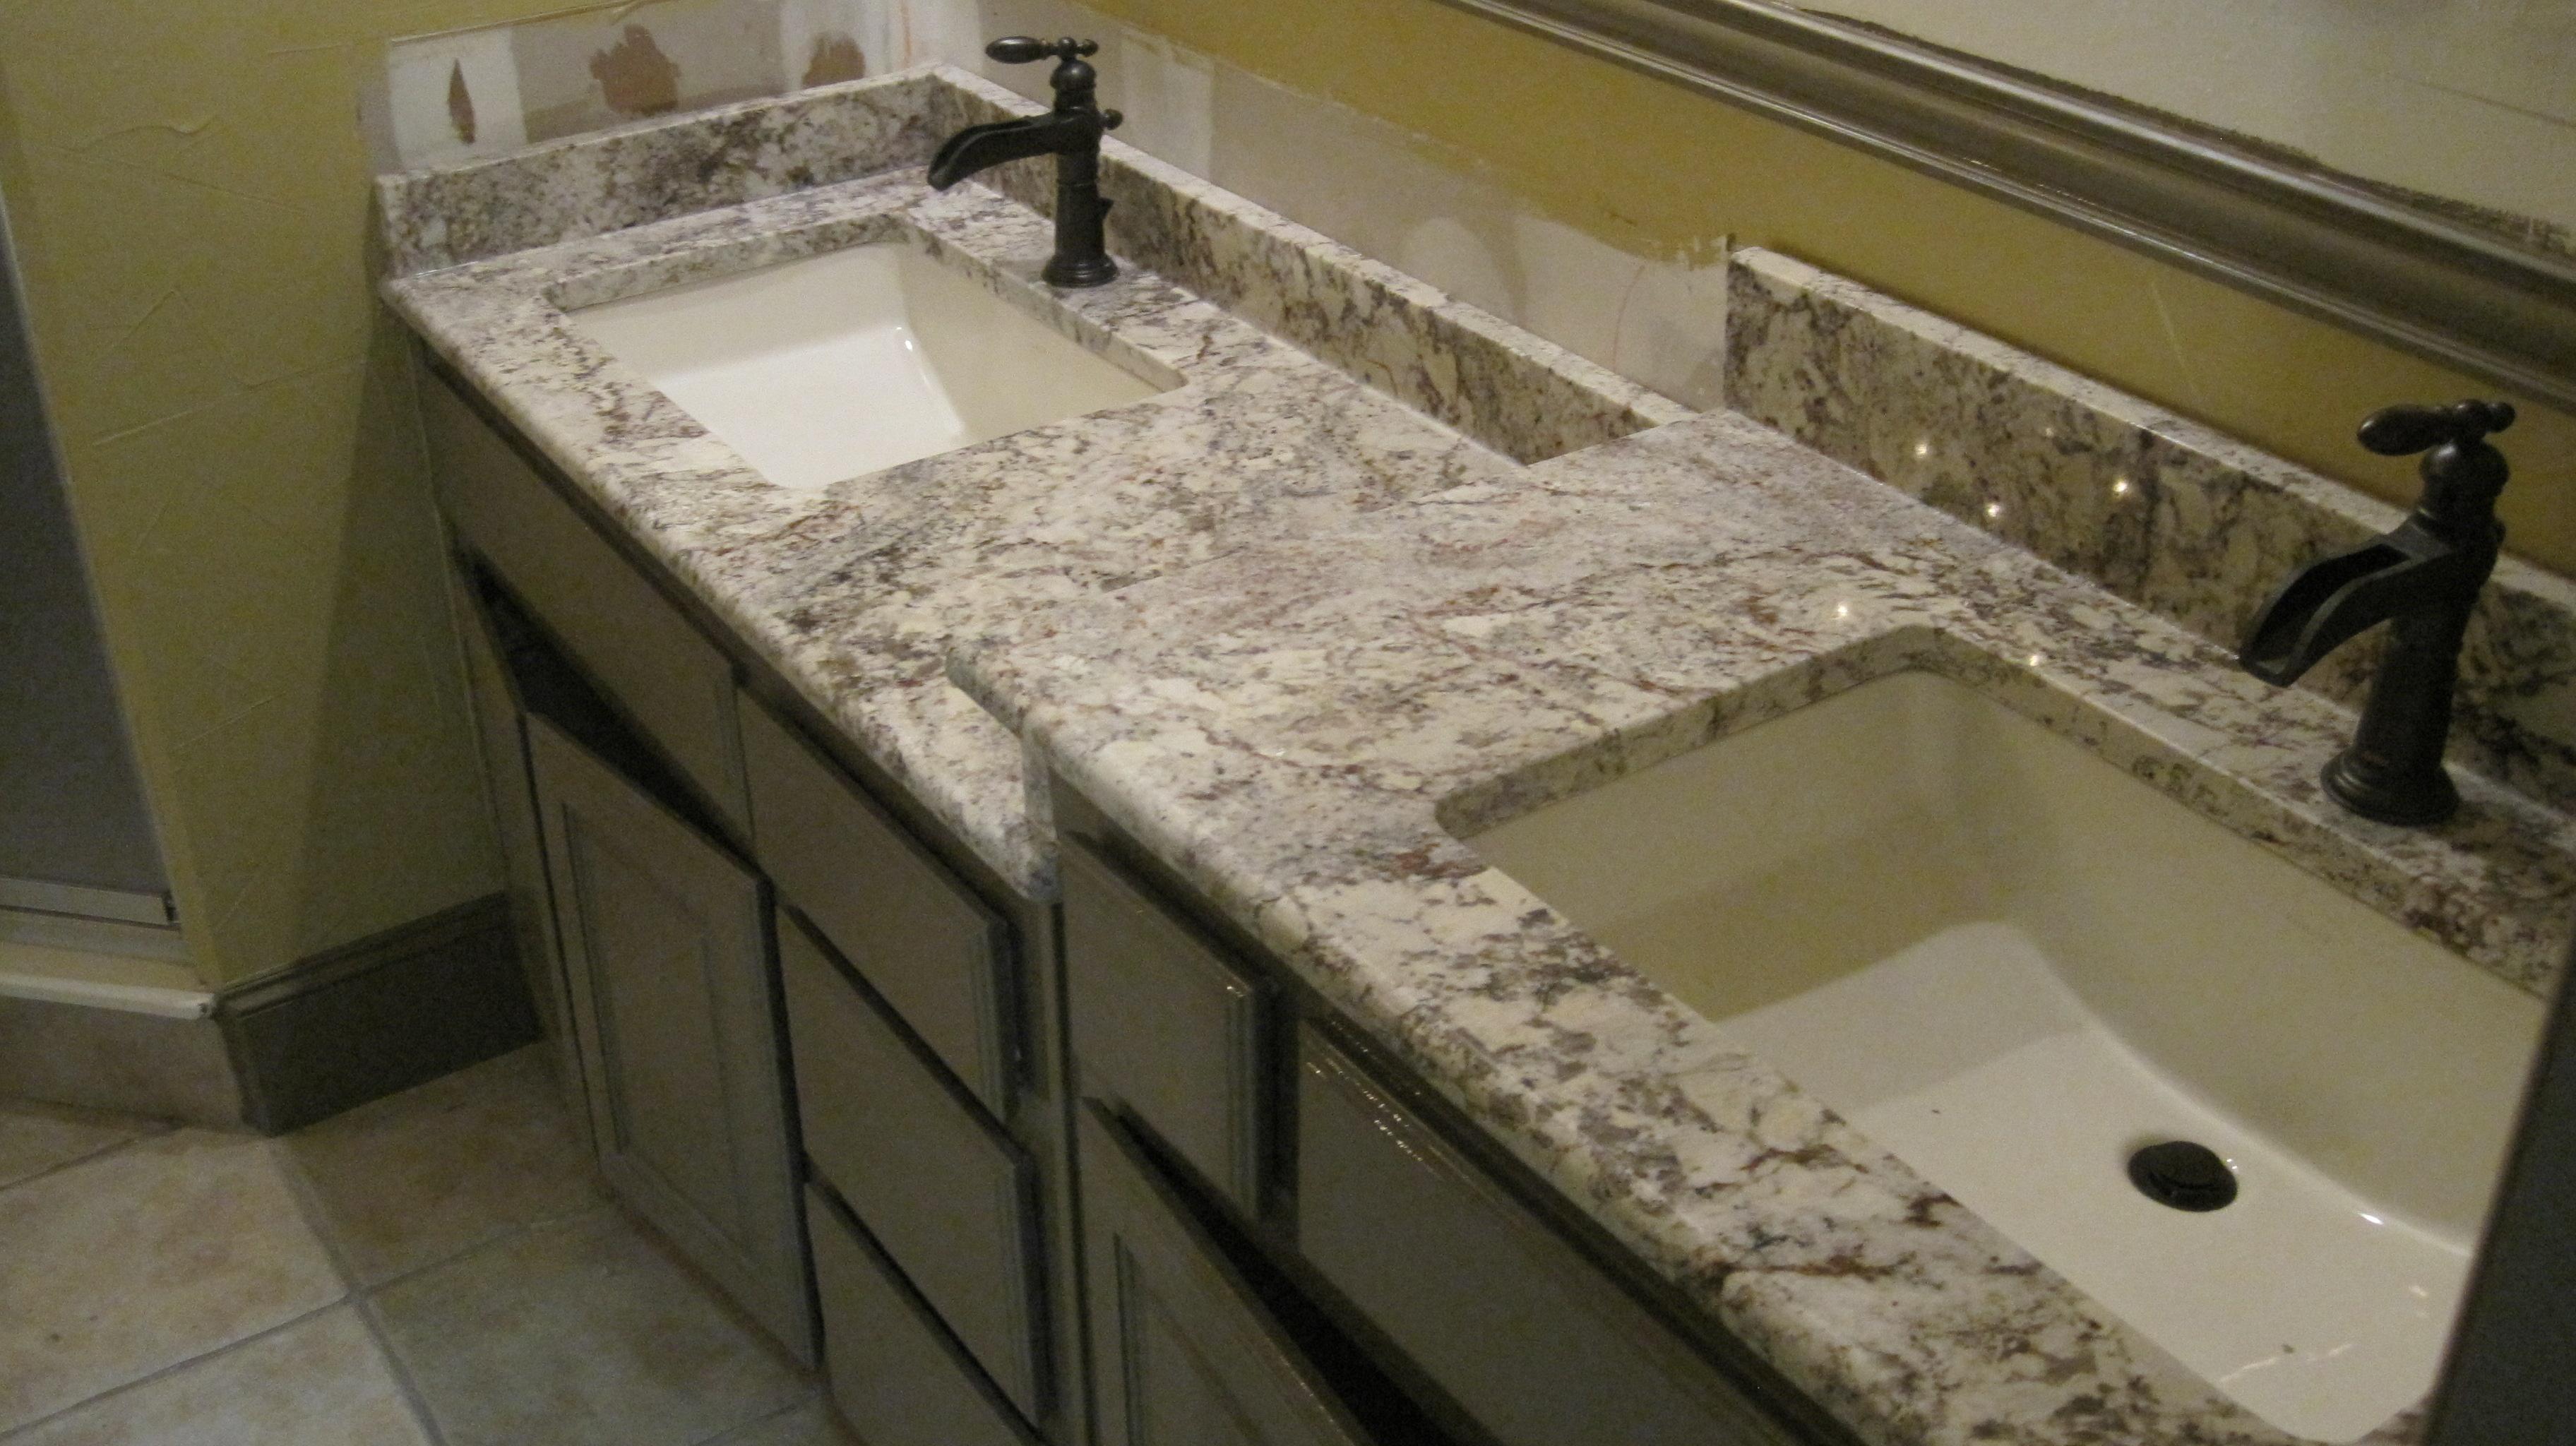 Charmant Granite Countertops, Kitchen Island, Bathroom Vanity  Bathroomcounter 149x149 Bahtroom Vanity, Bath Counter